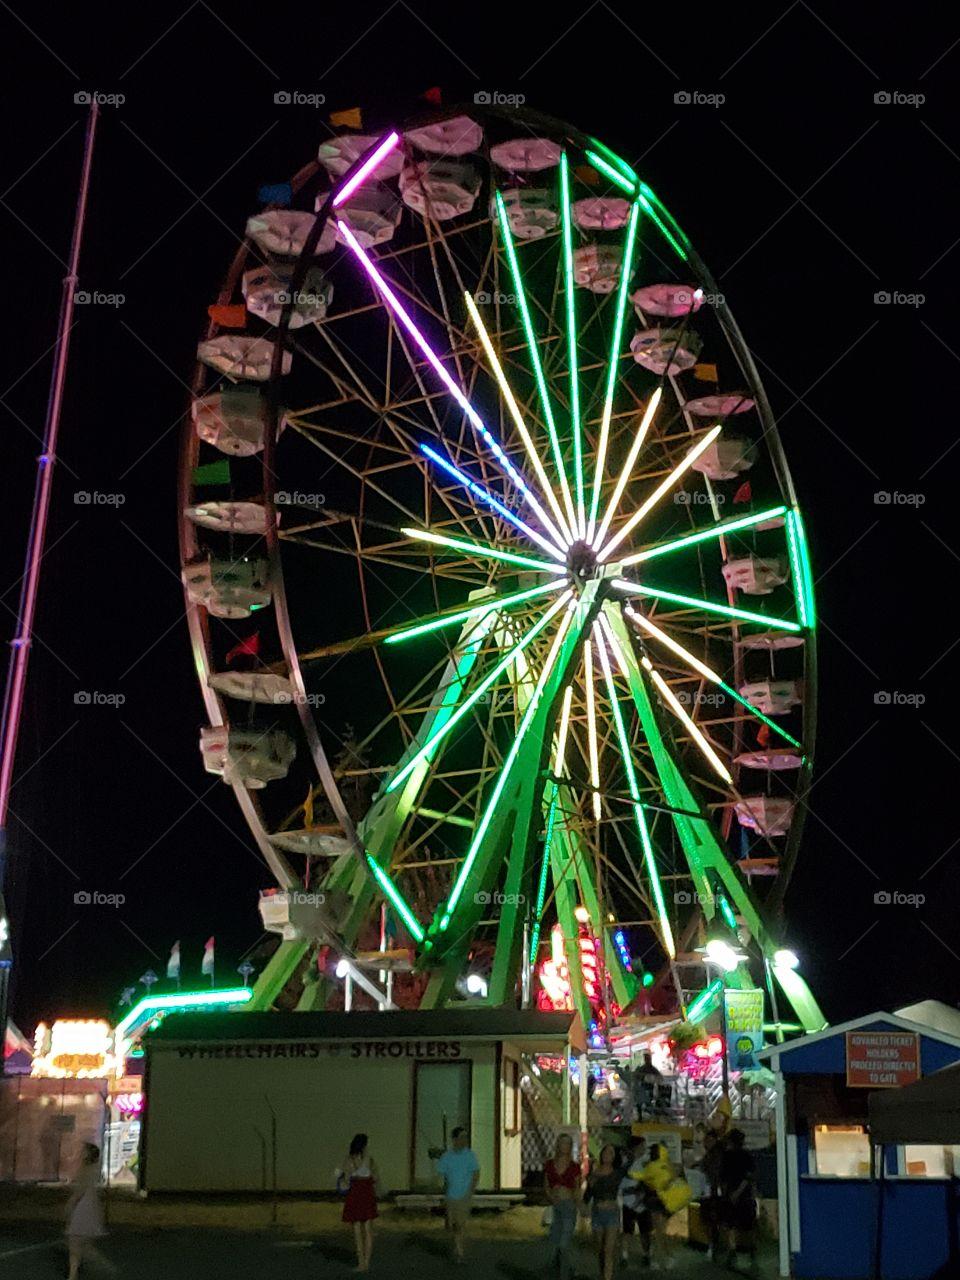 Festival ferris wheel at night